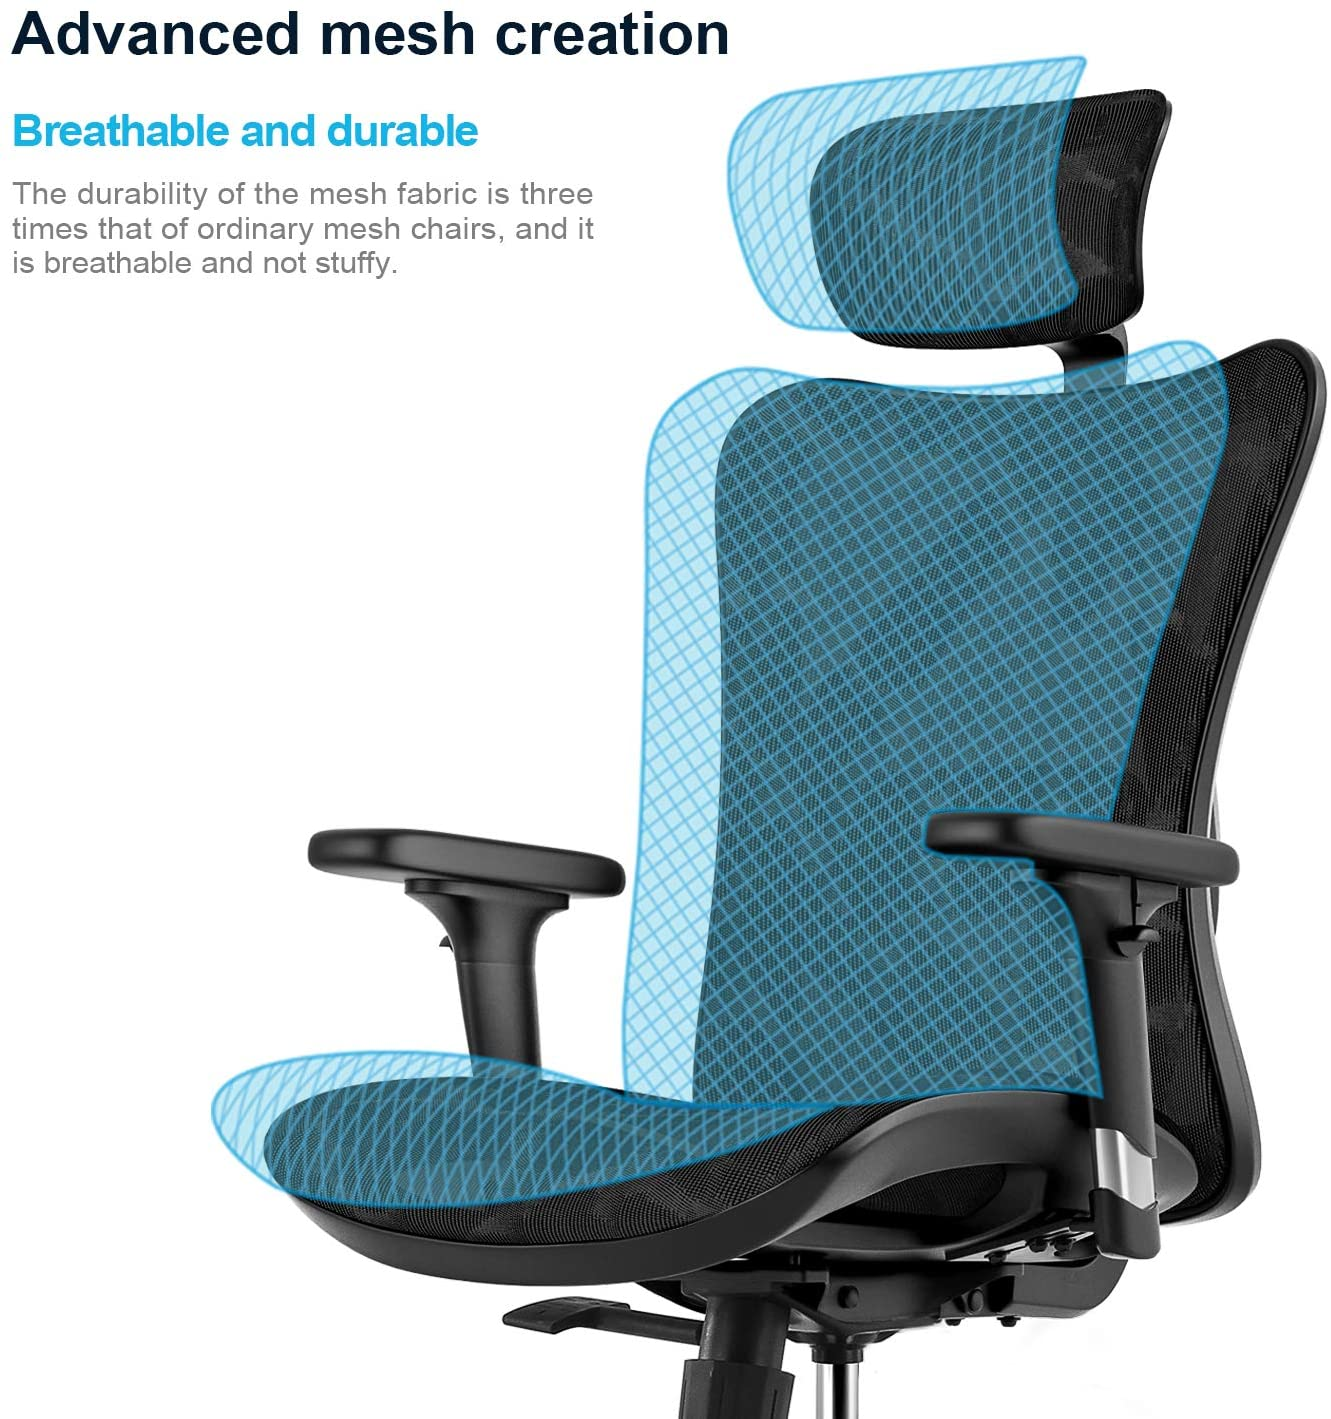 sihoo m57 ergonomic office chair sihoo m57 ergonomic office chair review